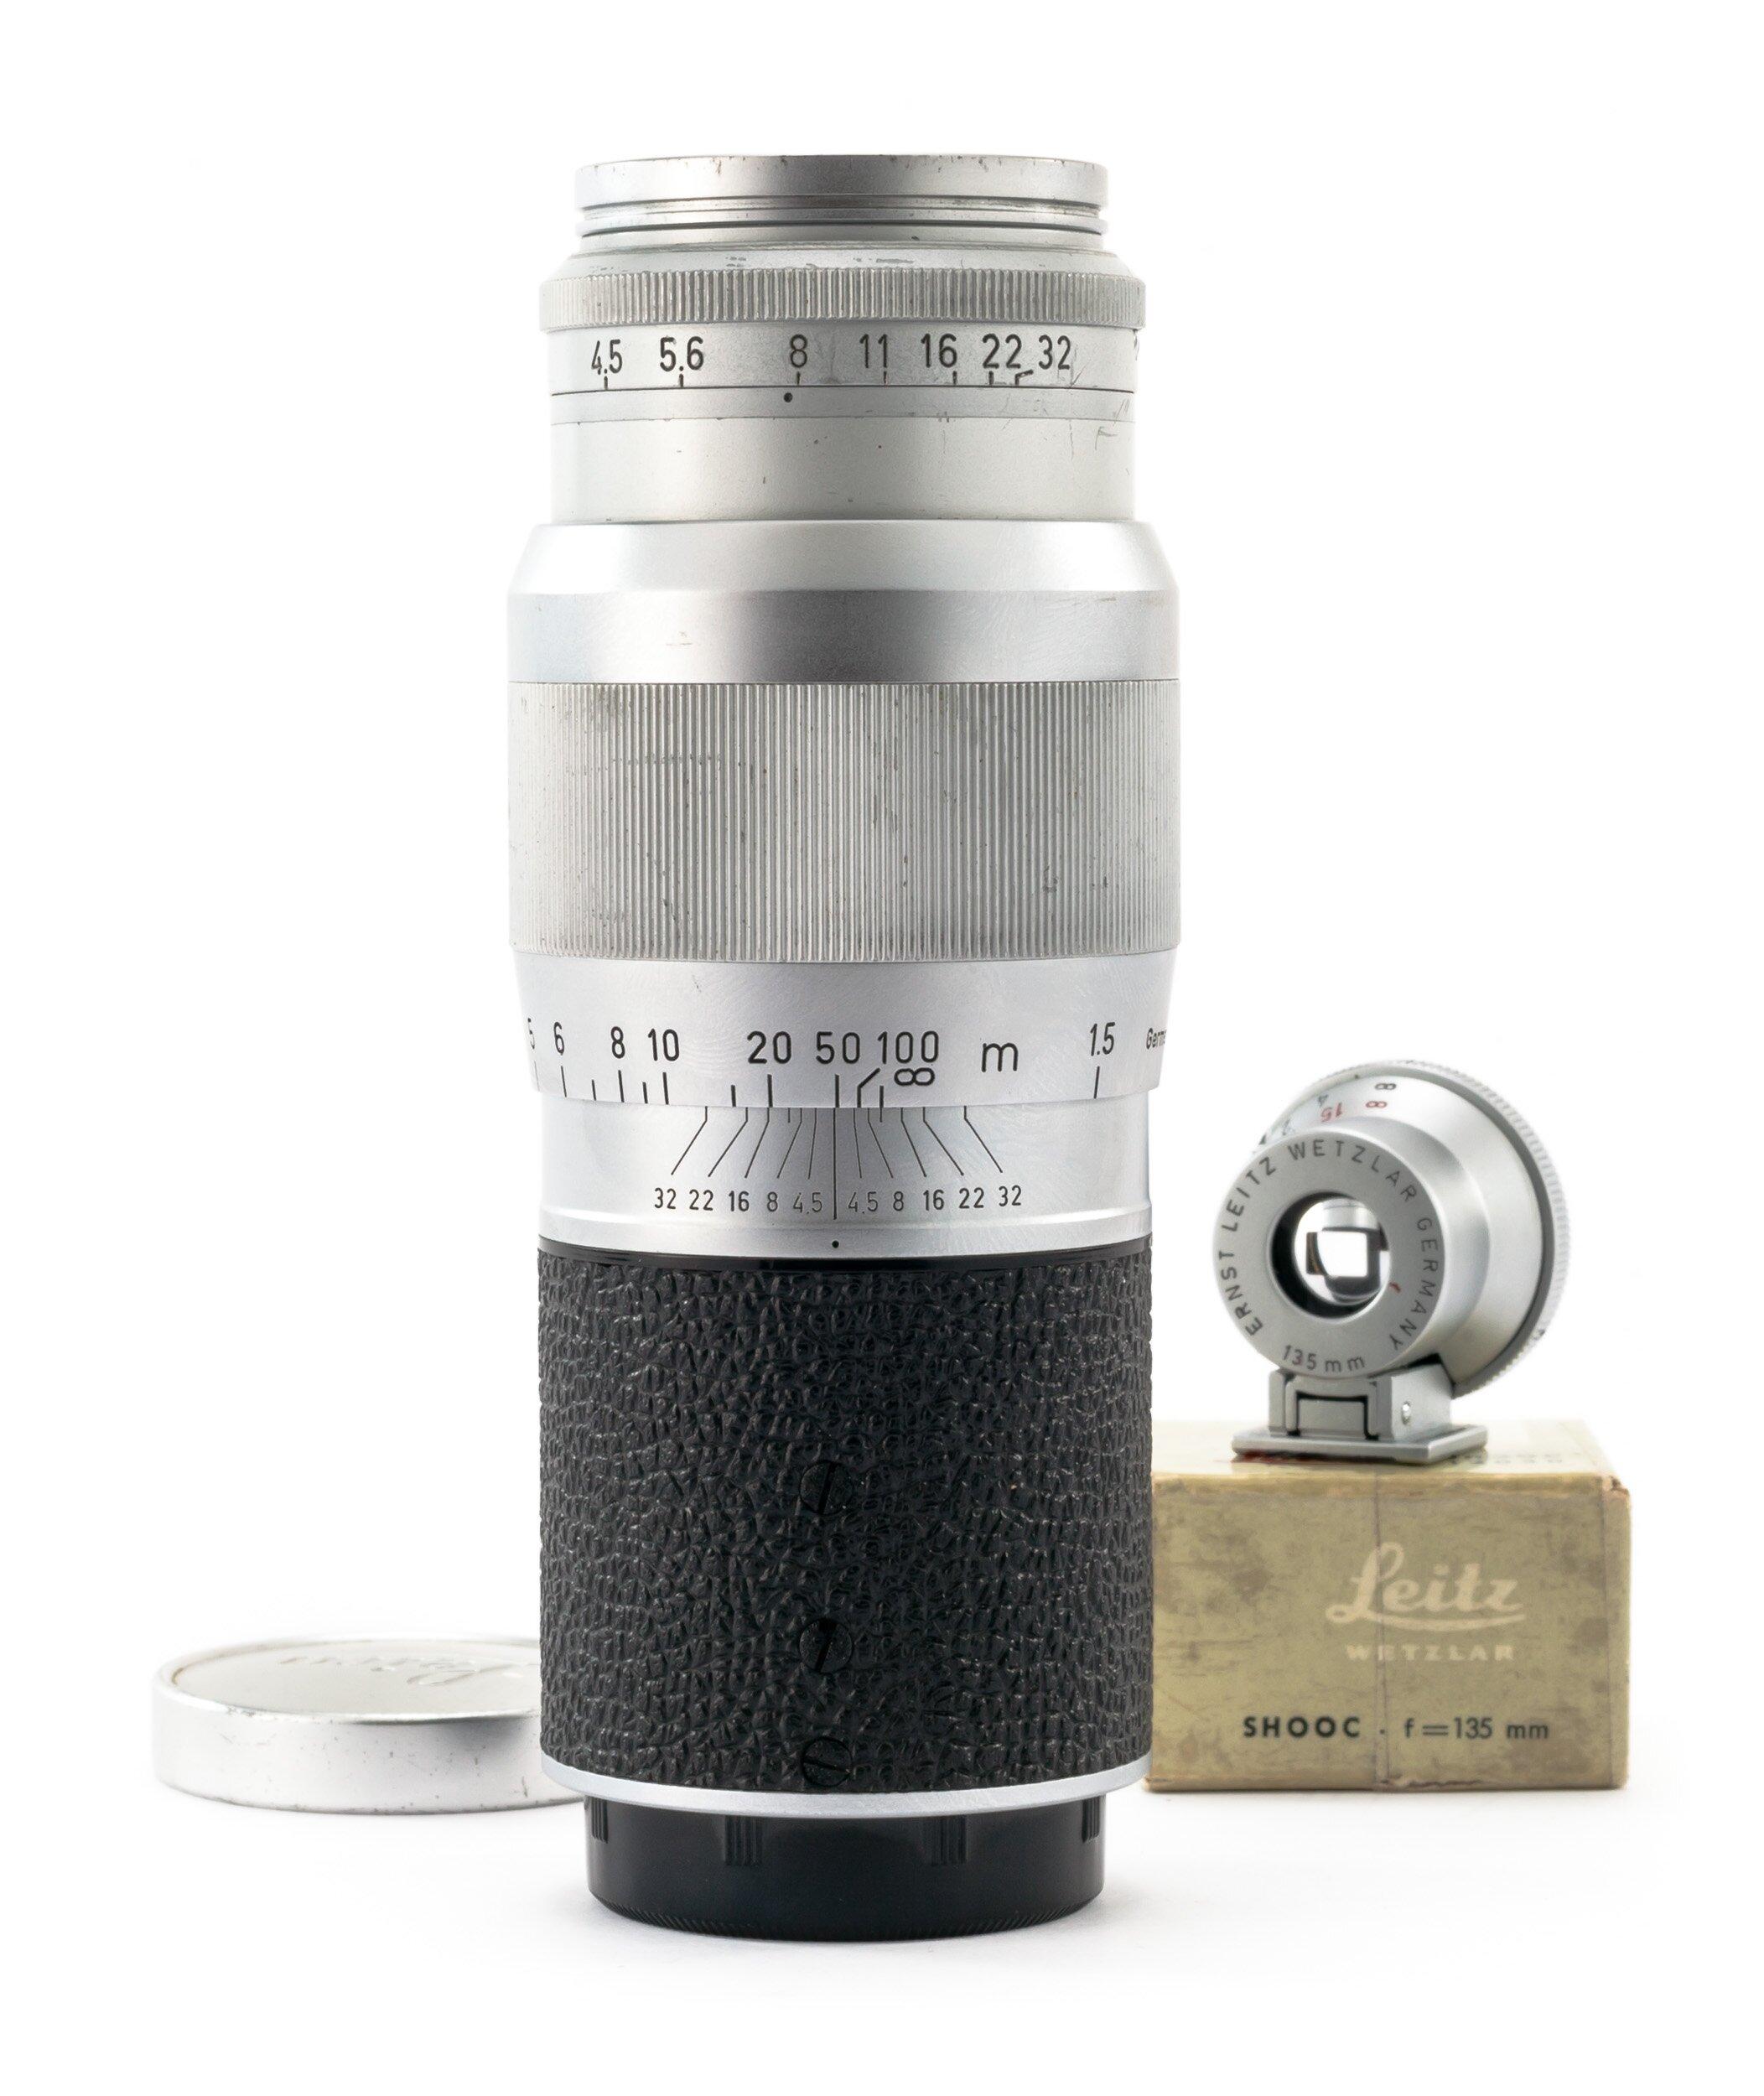 Leica Hektor 13,5cm F4.5 mit Leica SHOOC Sucher